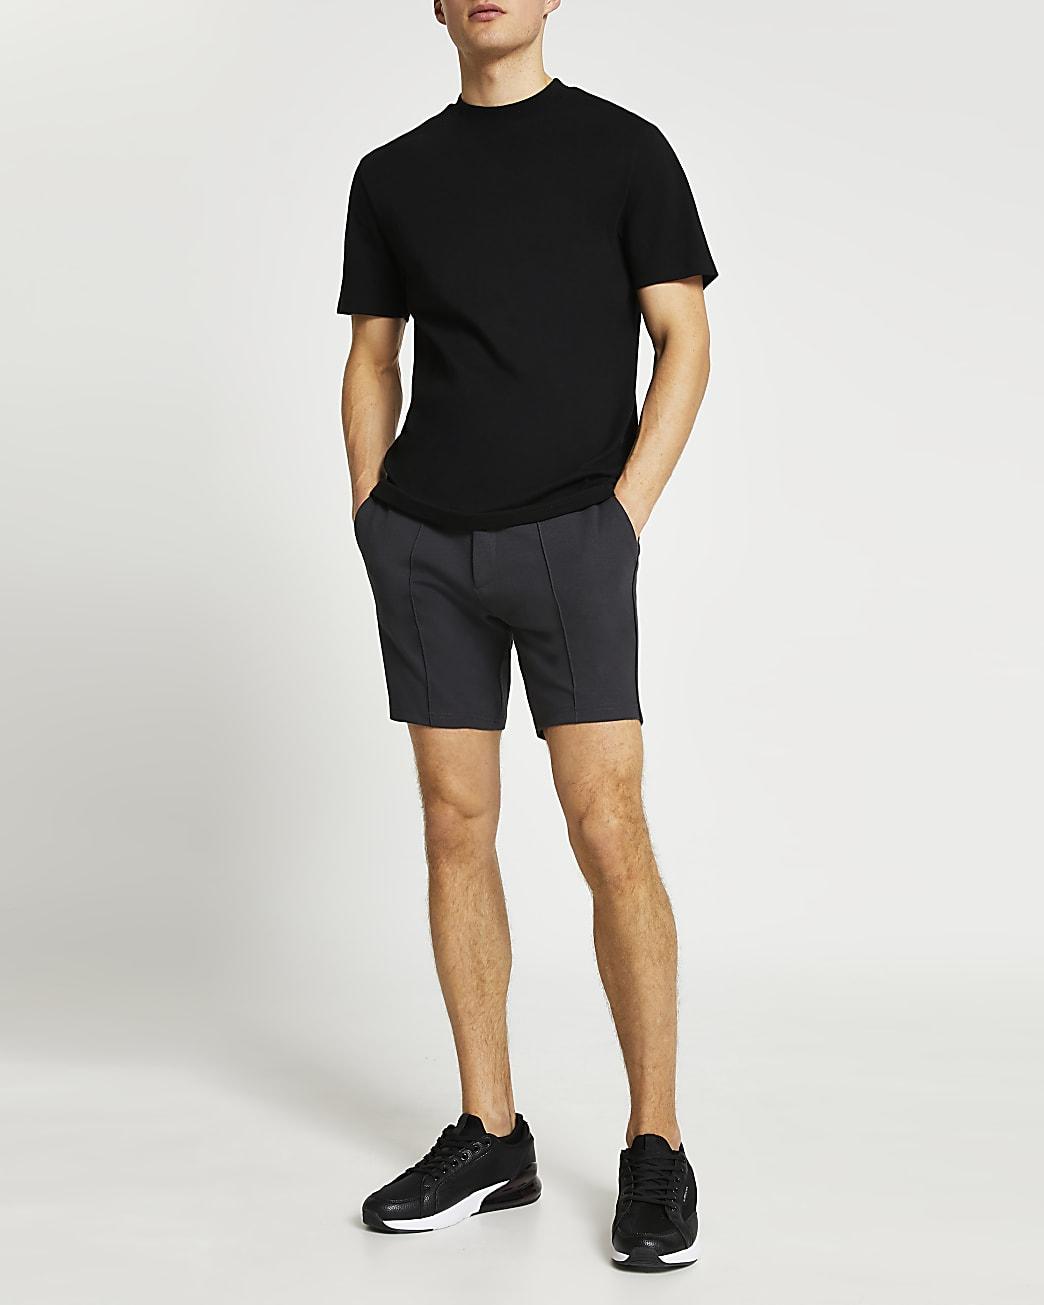 Grey drawstring skinny fit shorts